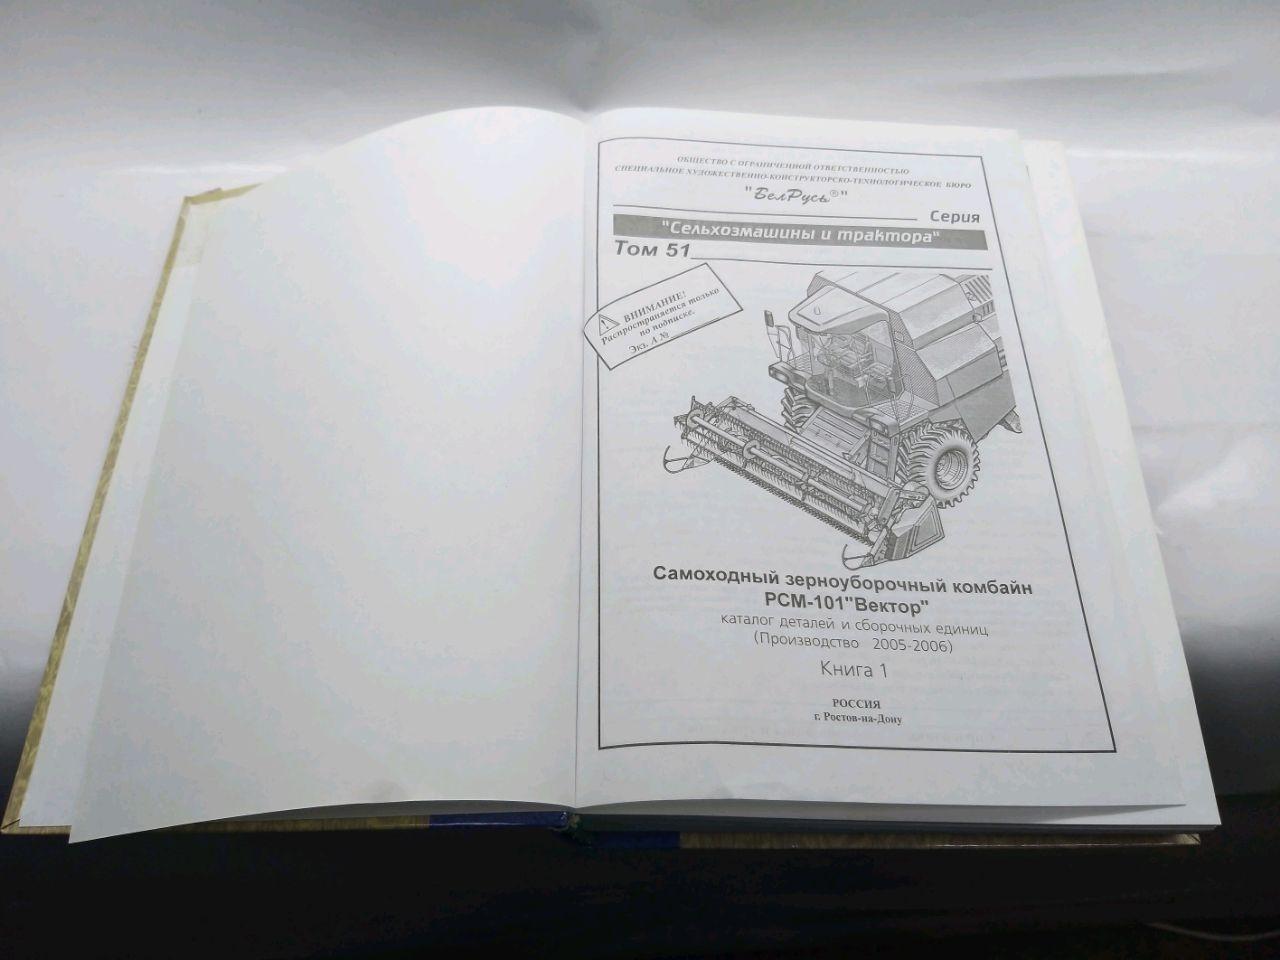 Catalog МУЛЕЩК-101